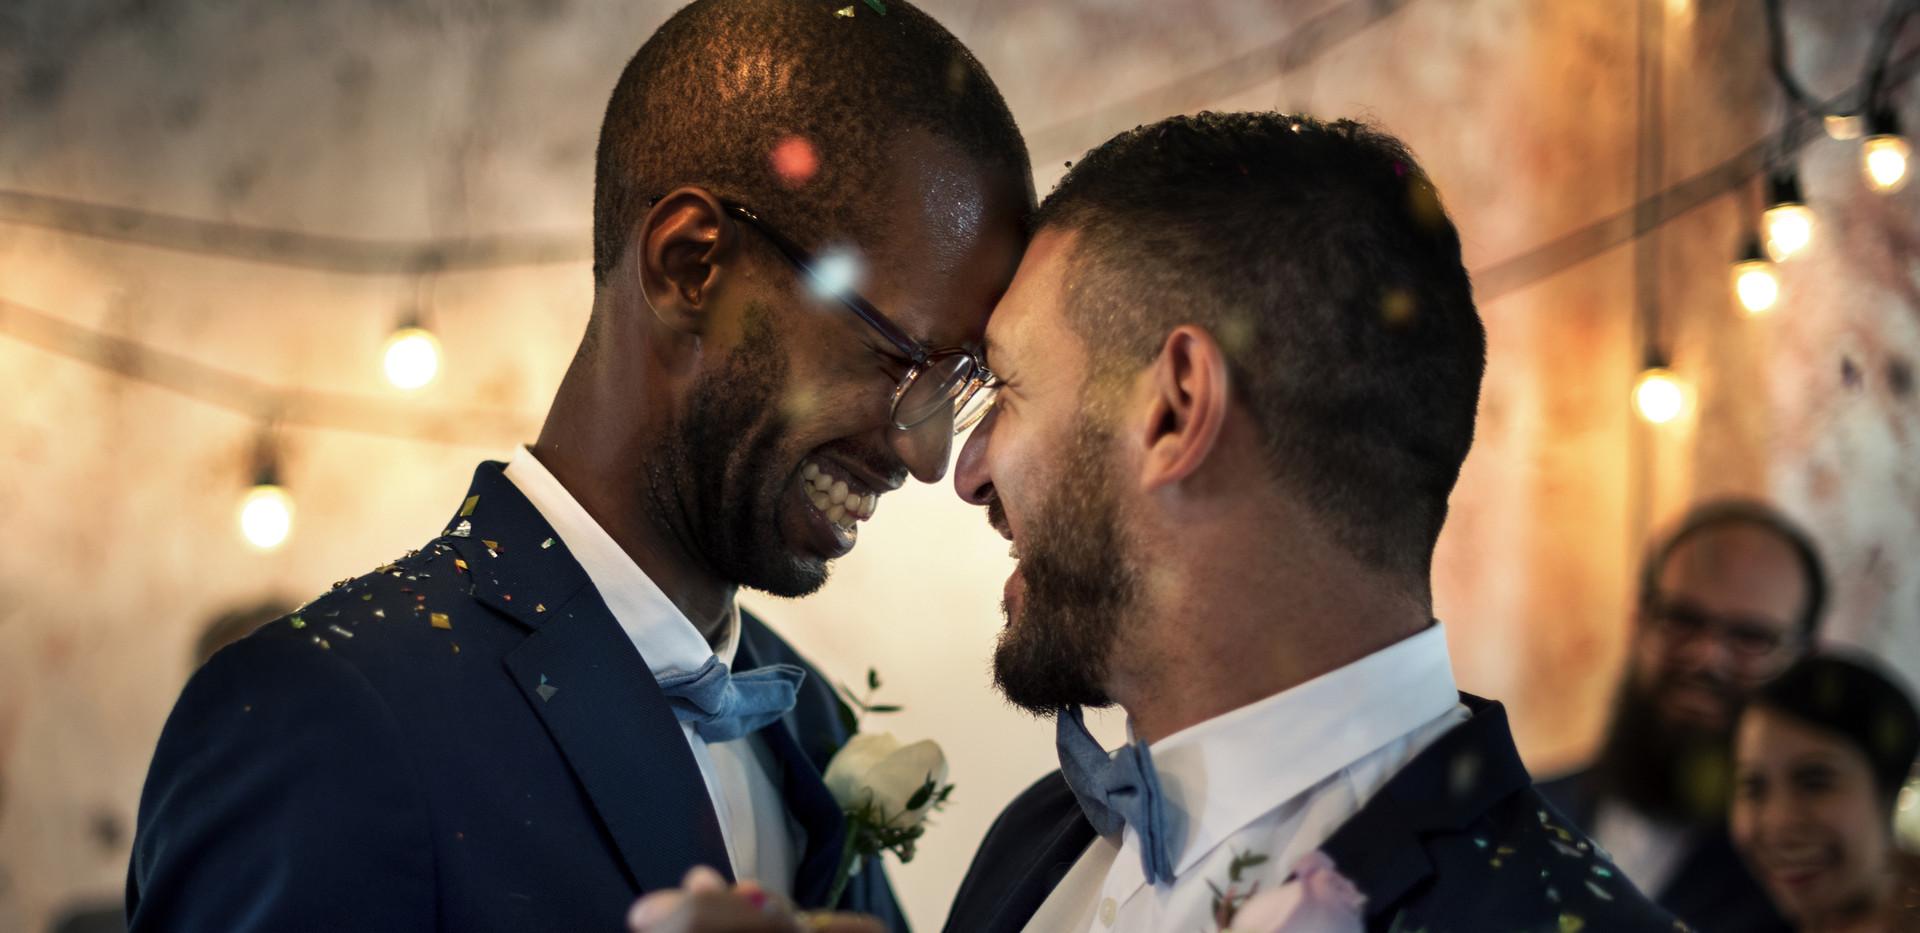 LGBTQ Friendly DJ service in Wilmington NC offering affordable wedding dj services.